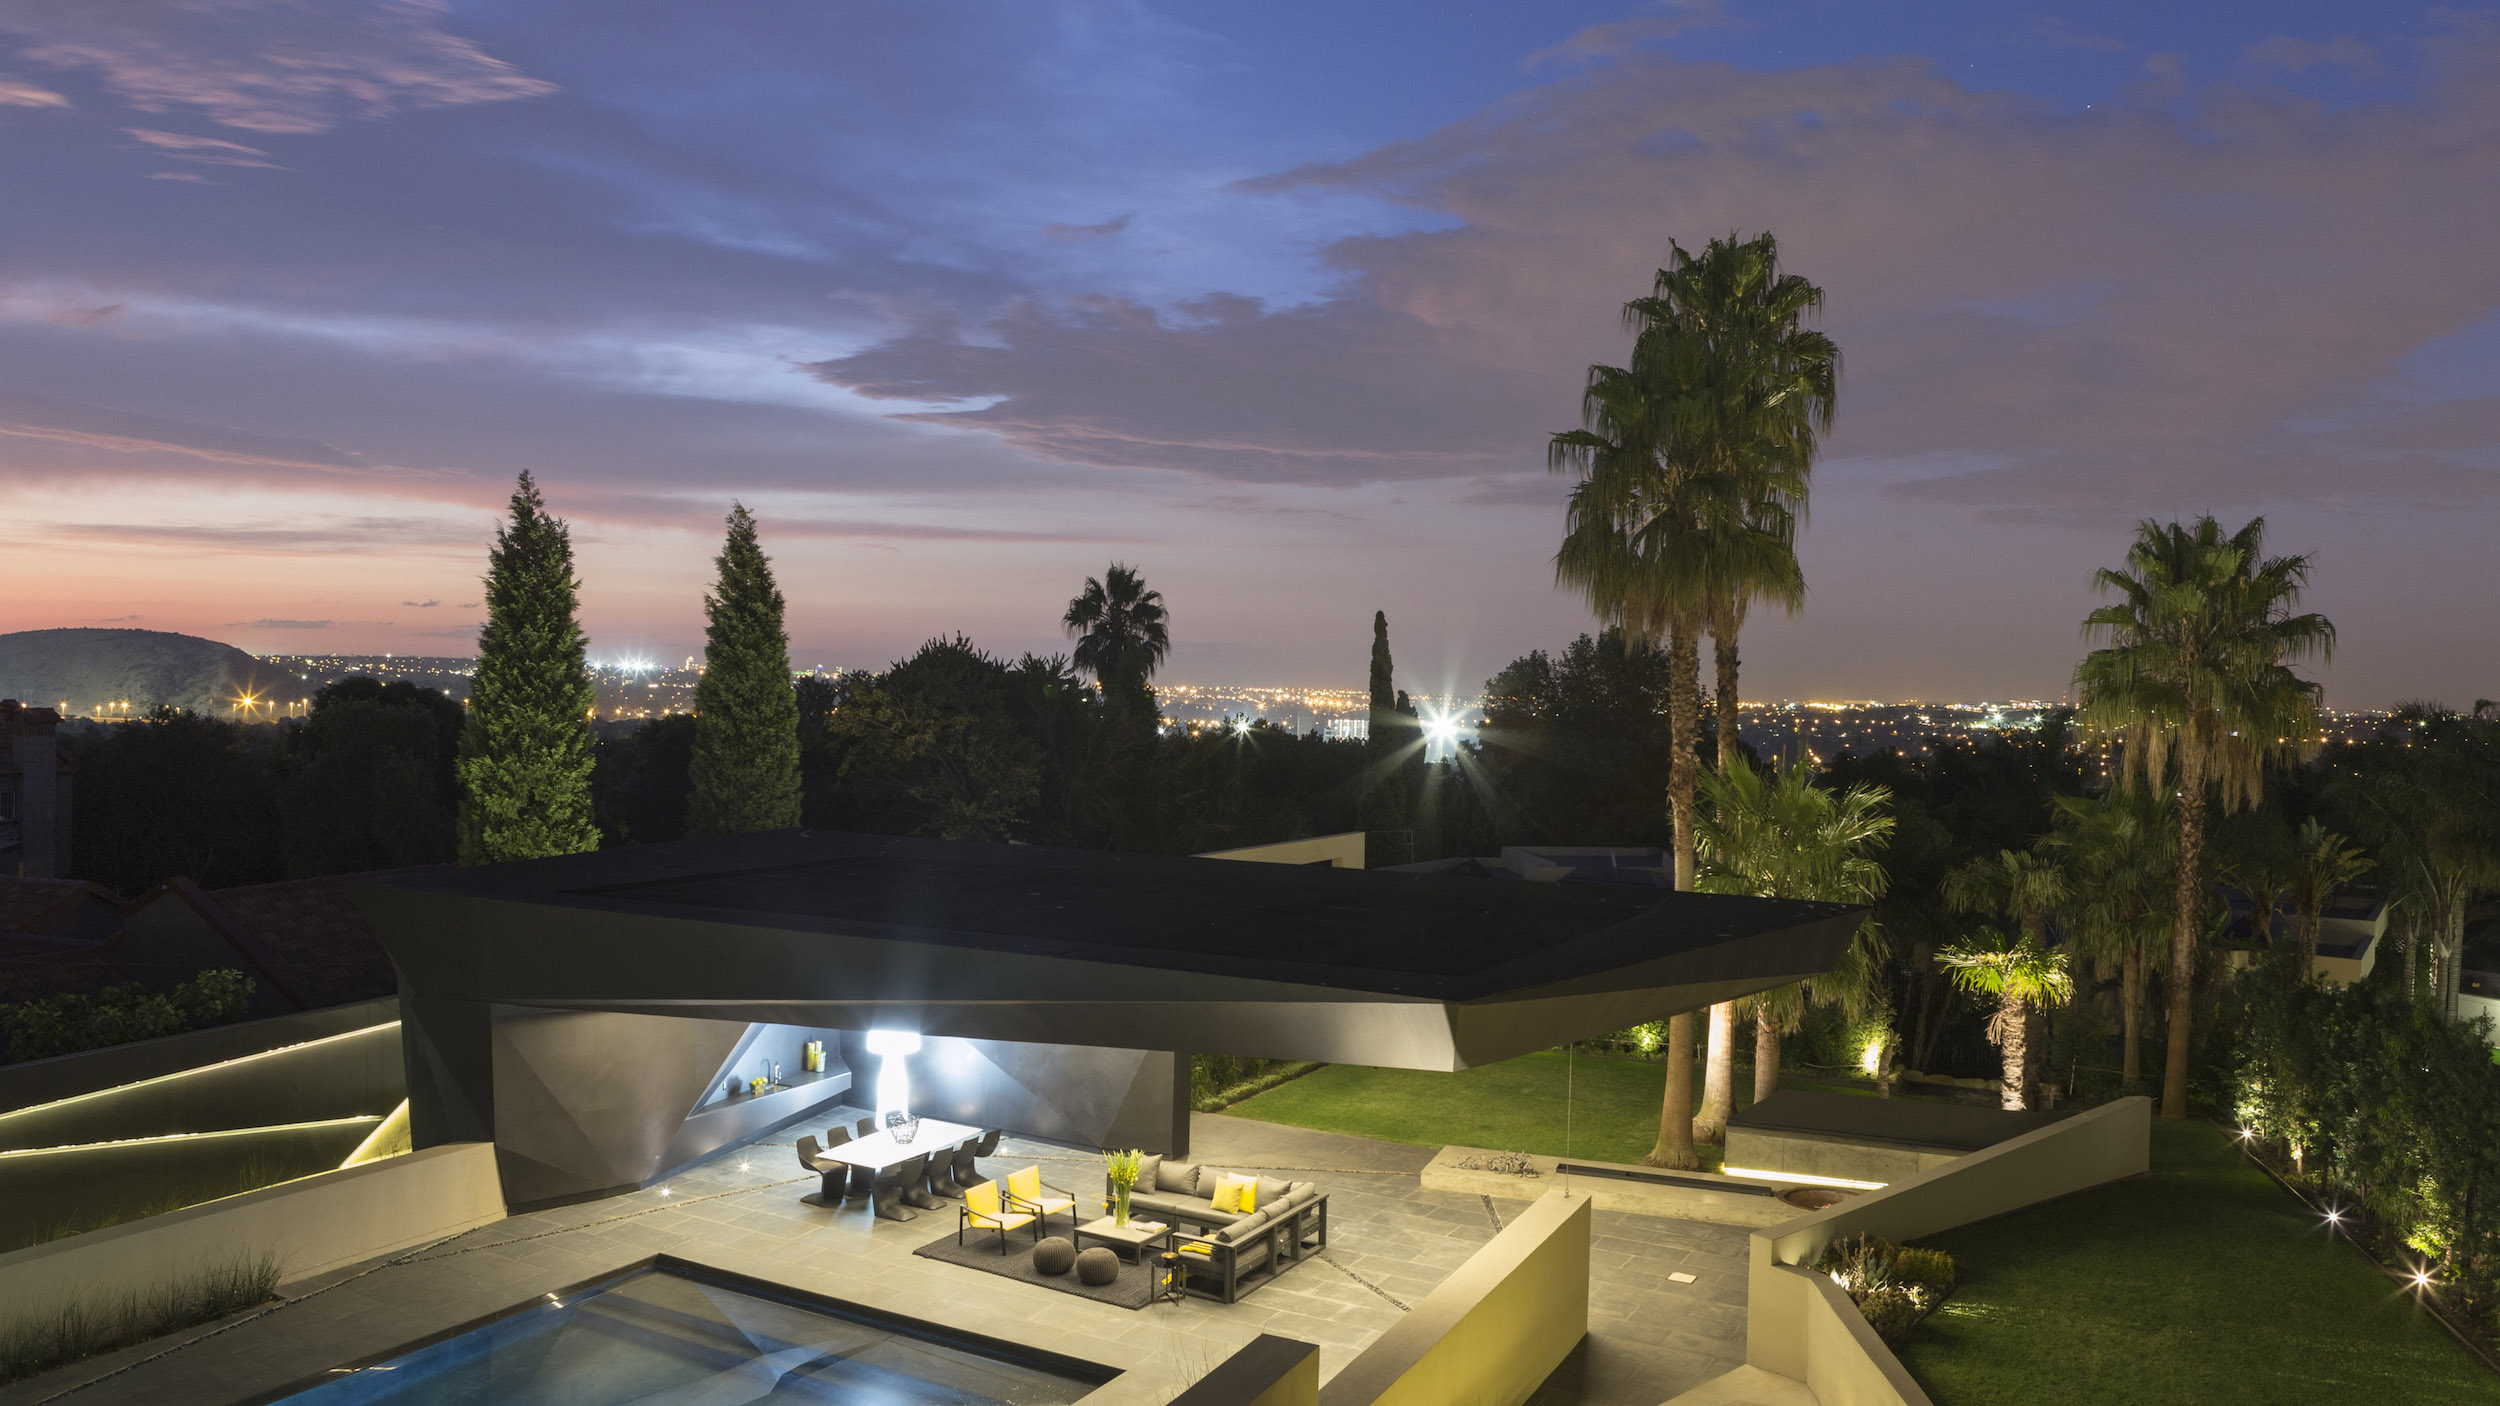 Kloof Road Masterpiece House in Johannesburg by Nico van der Meulen Architects-09